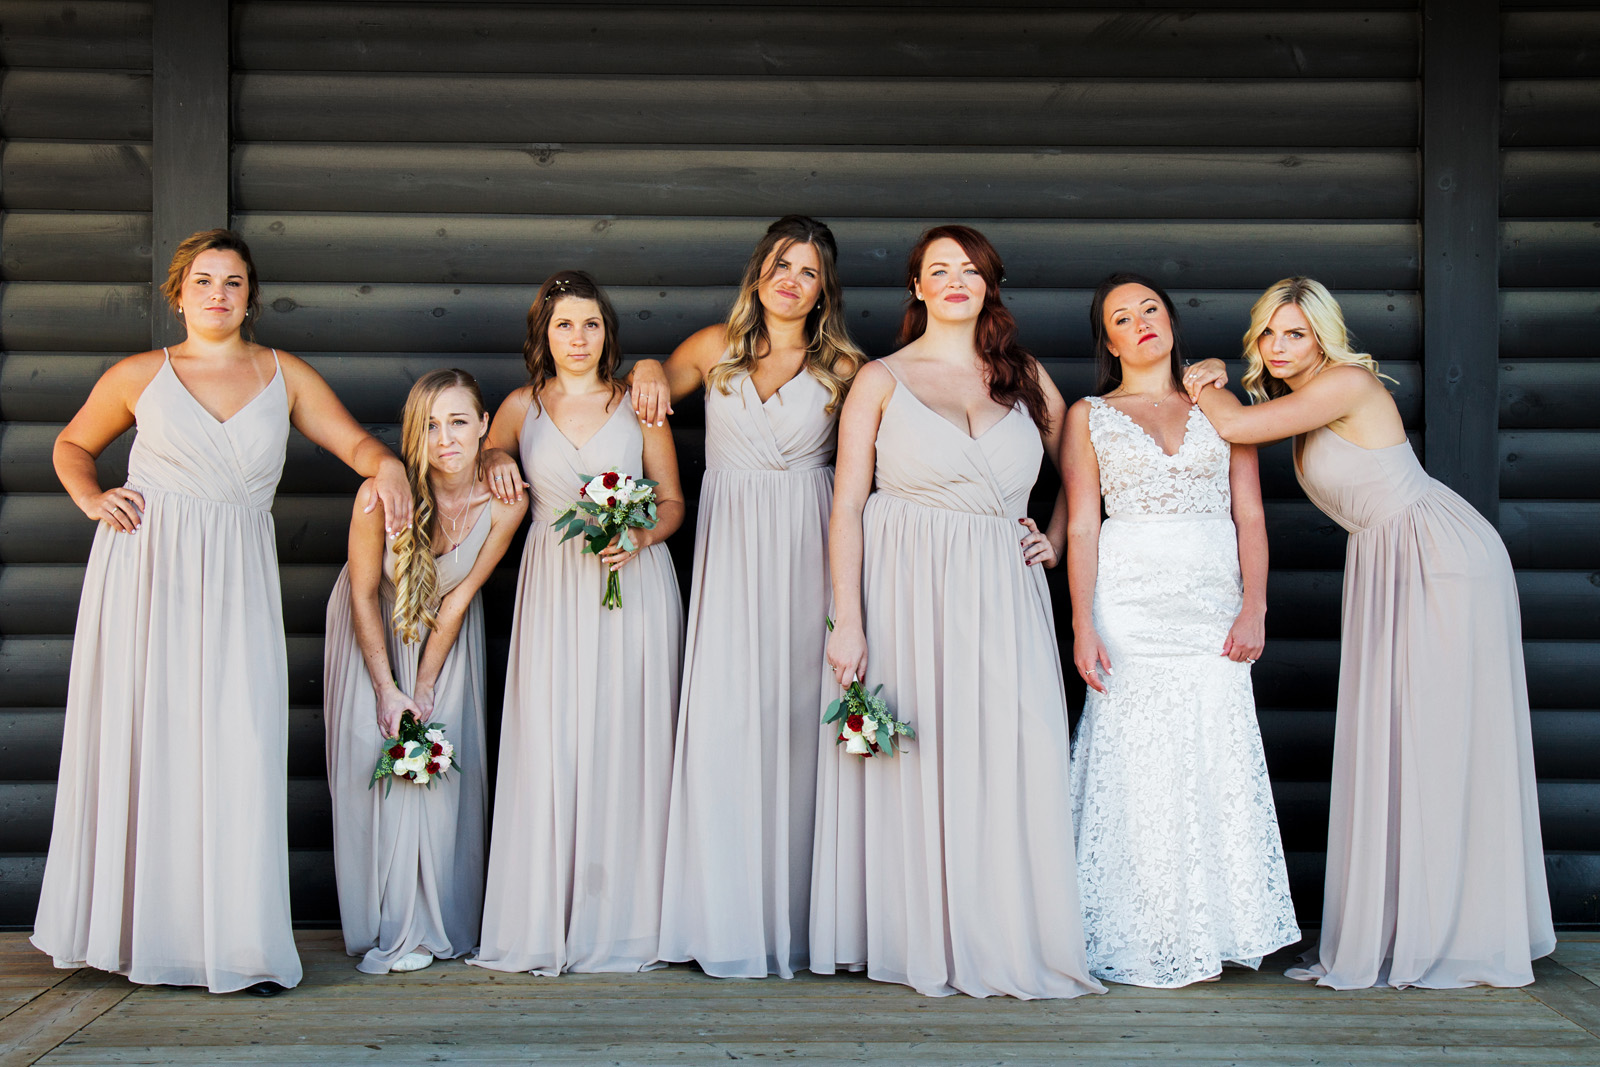 harris_wedding-2189.jpg